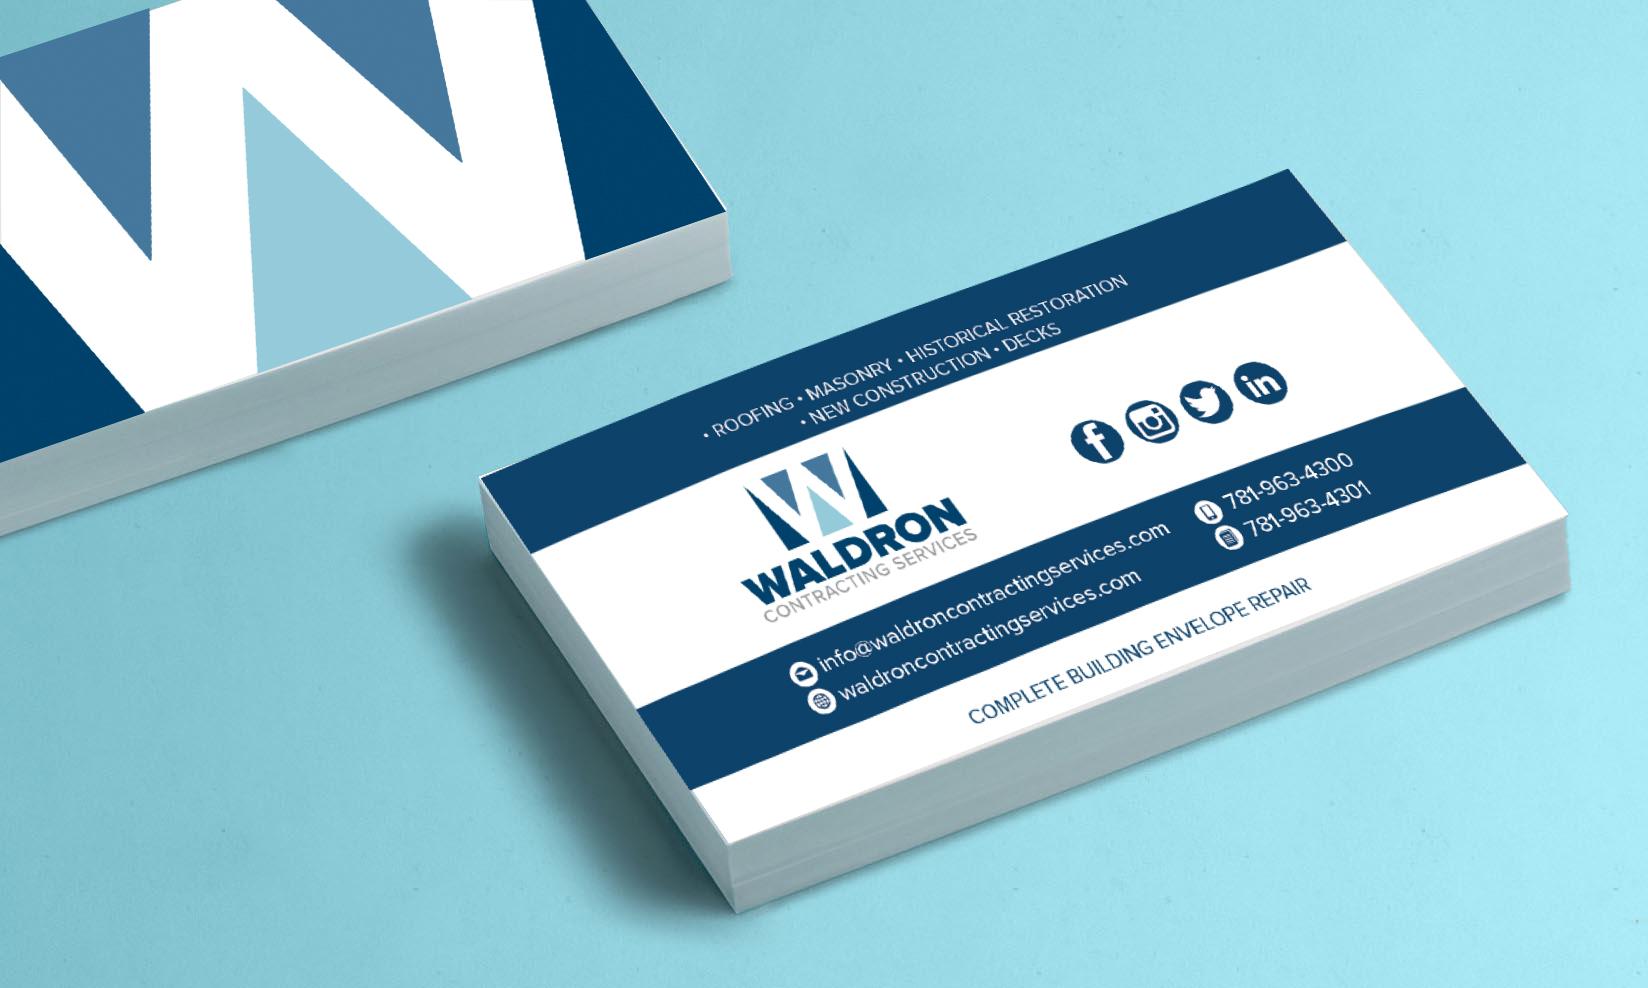 BUSINESS-CARD-MOCKUP-03.jpg